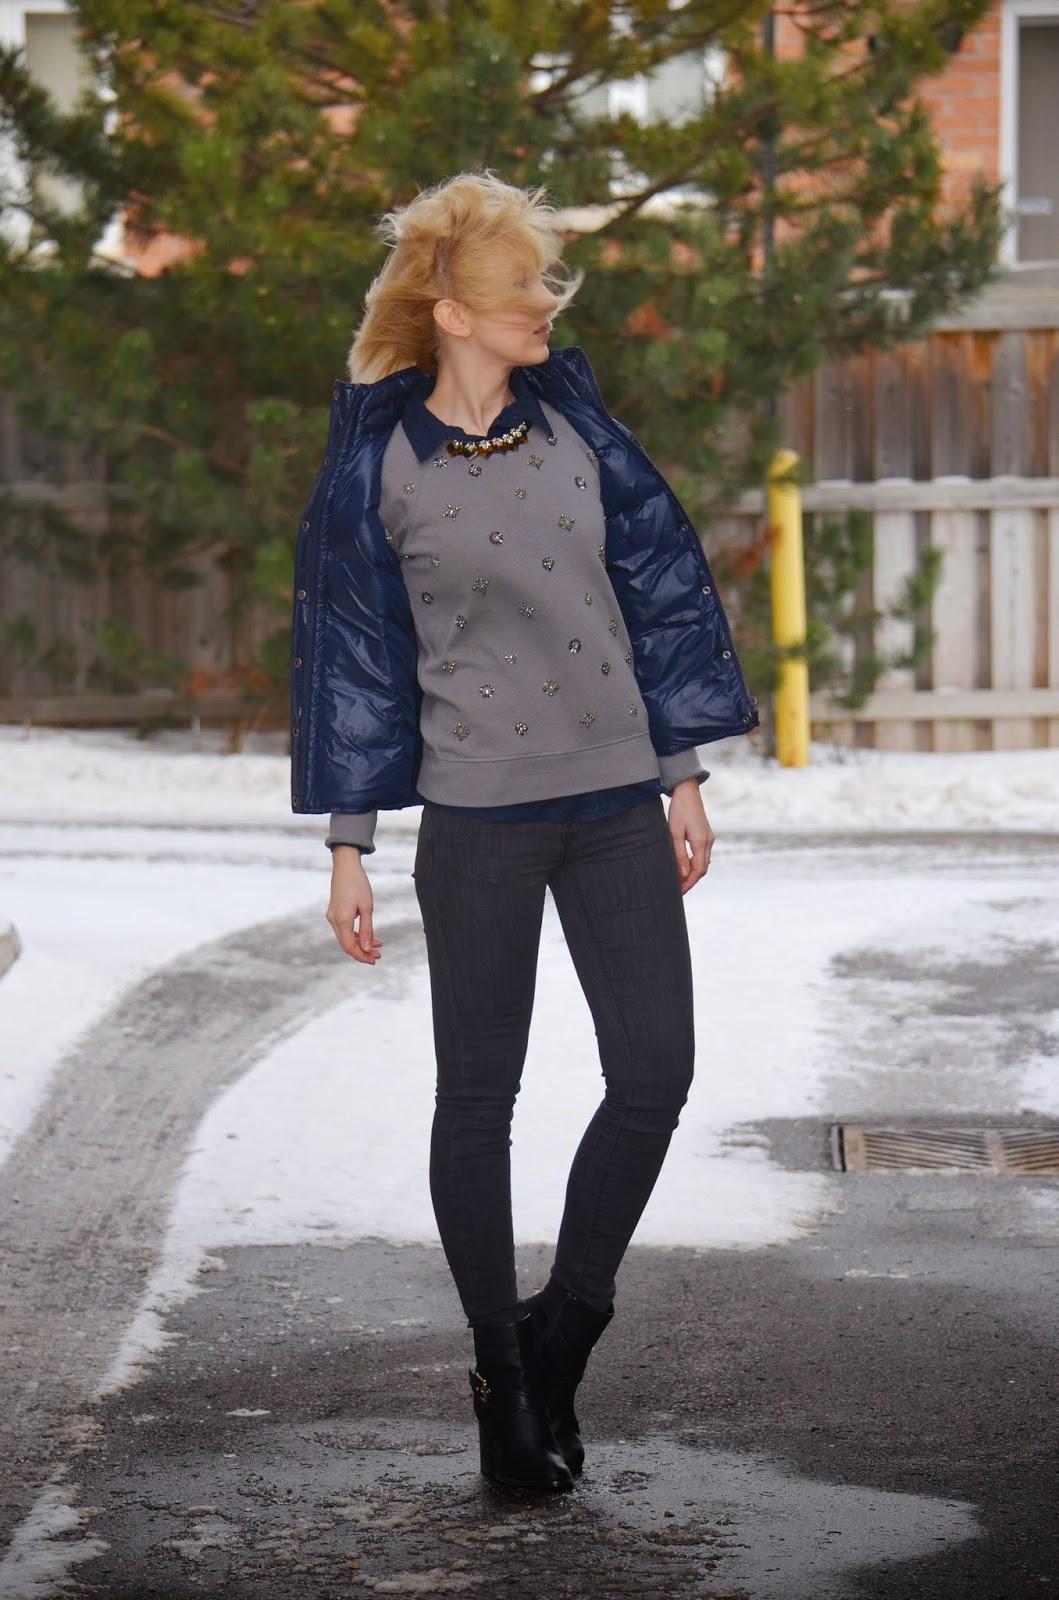 Style, casual, preppy style, J. Crew, J. Crew factory, Asos, Zara, puffer vest, winter style, vest style, preppy, sweatshirt, beaded sweatshirt